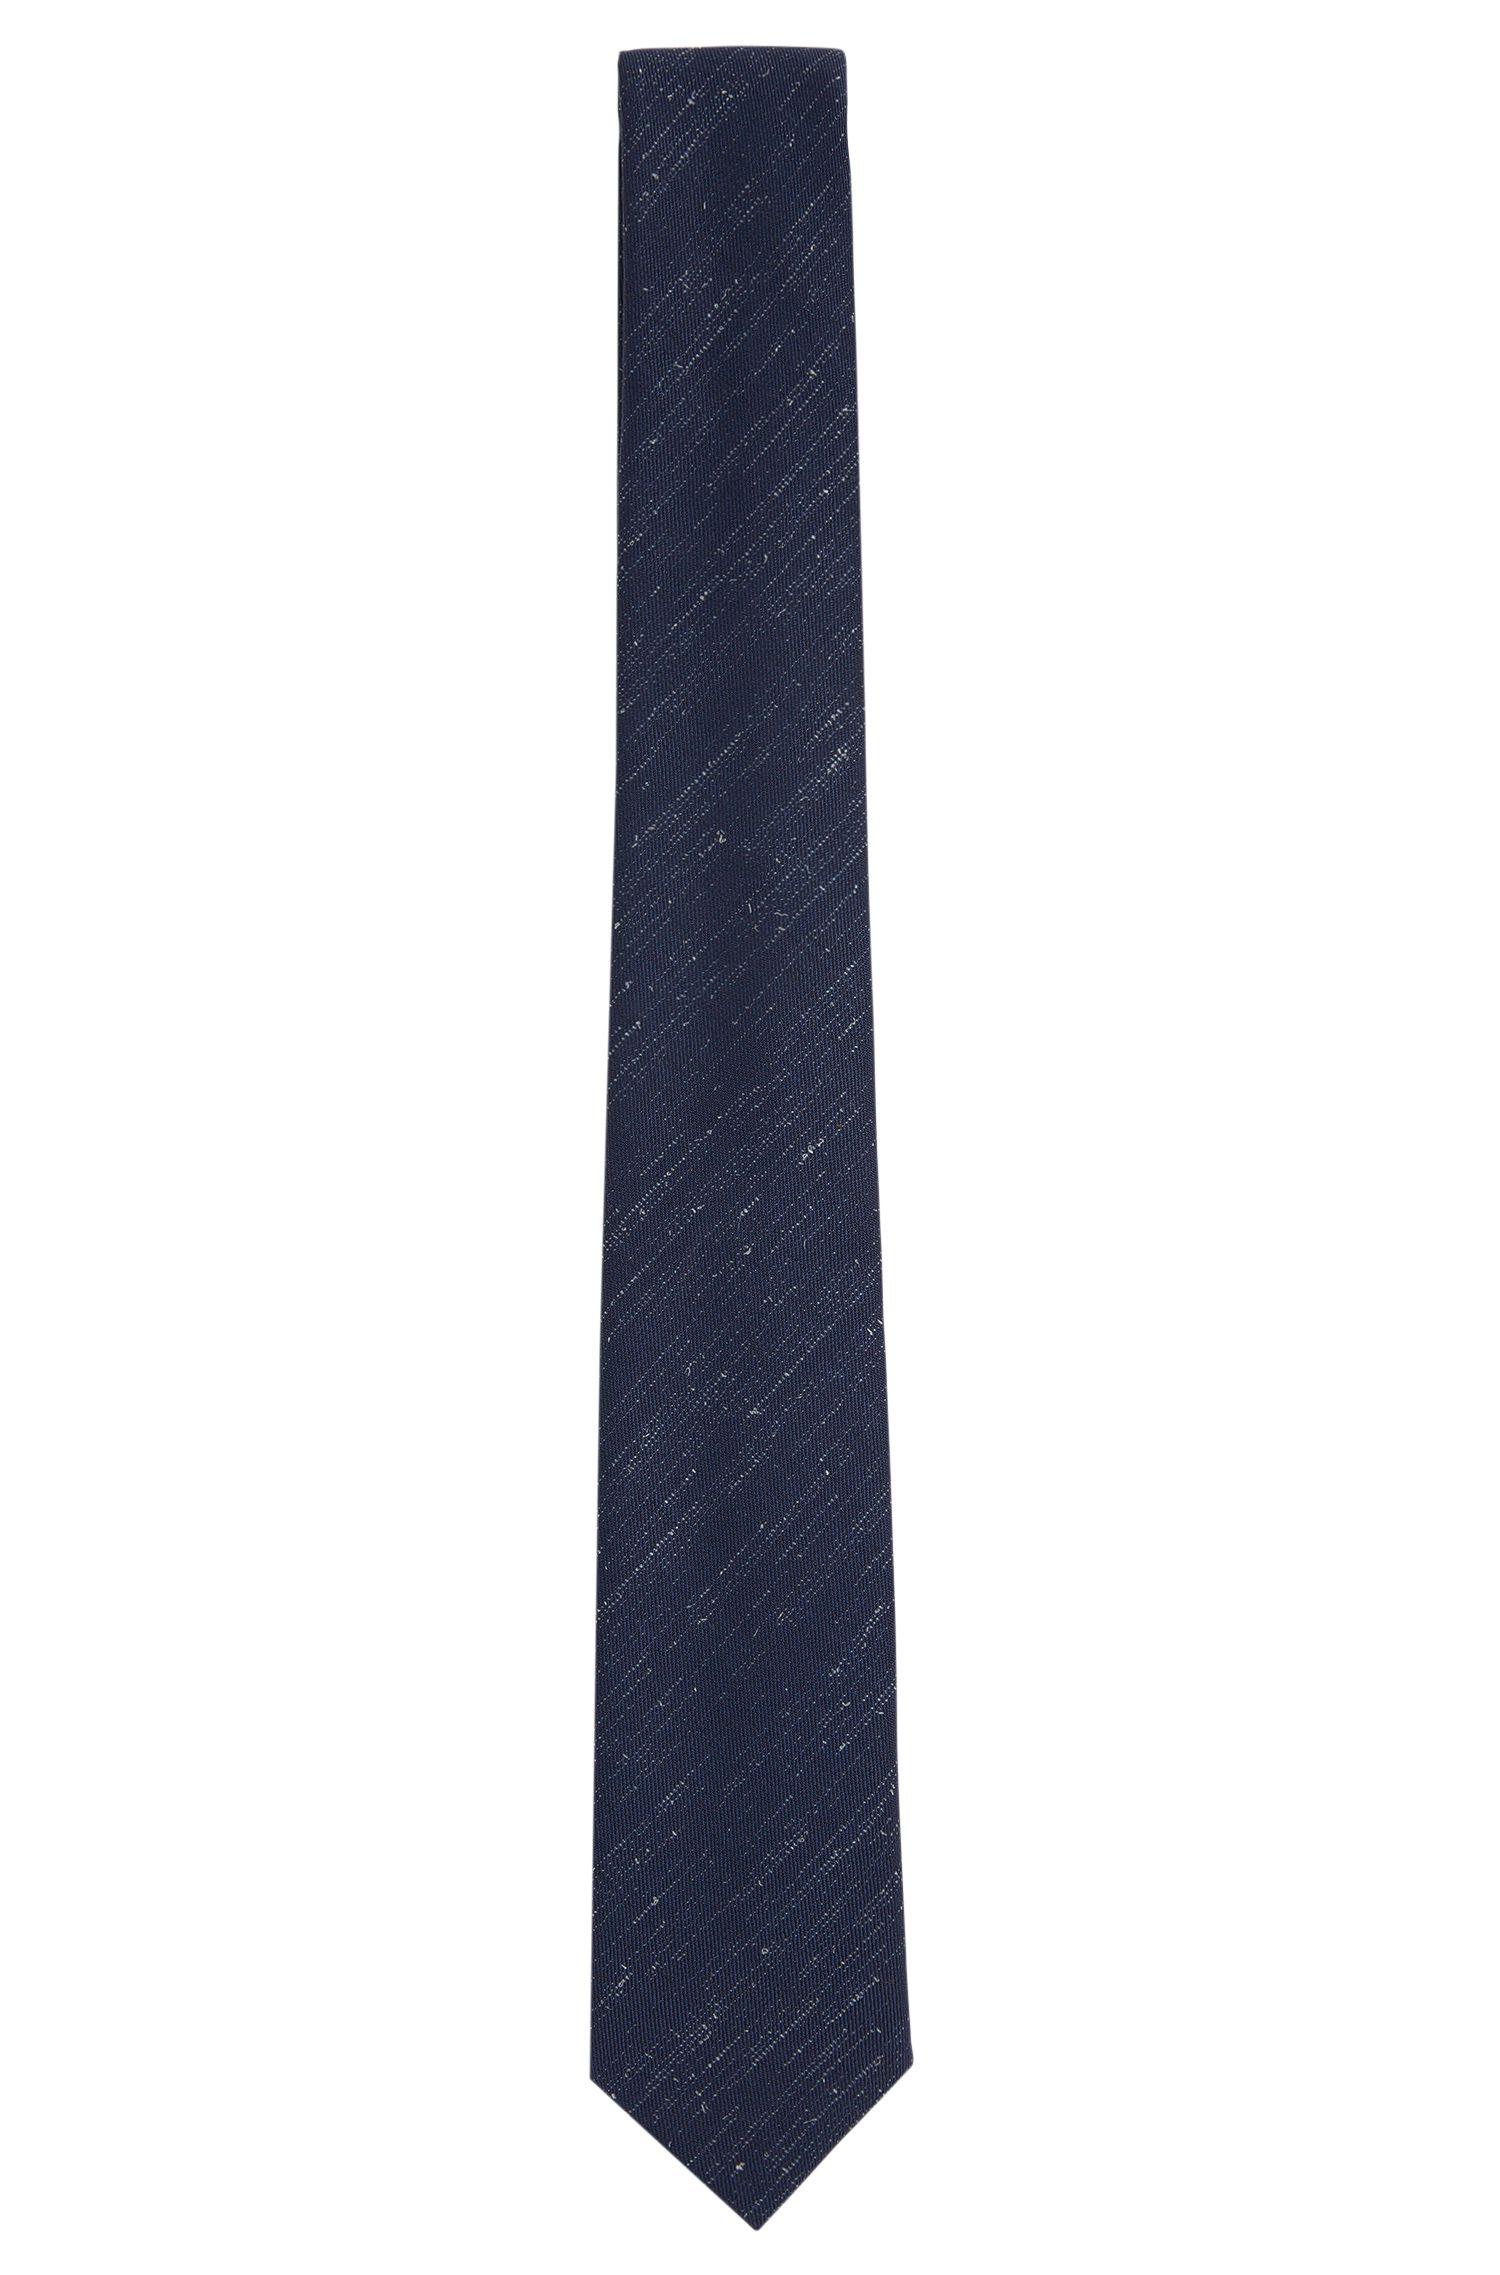 Fein gemusterte Krawatte aus Wolle: 'Tie 6 cm self-tipped'